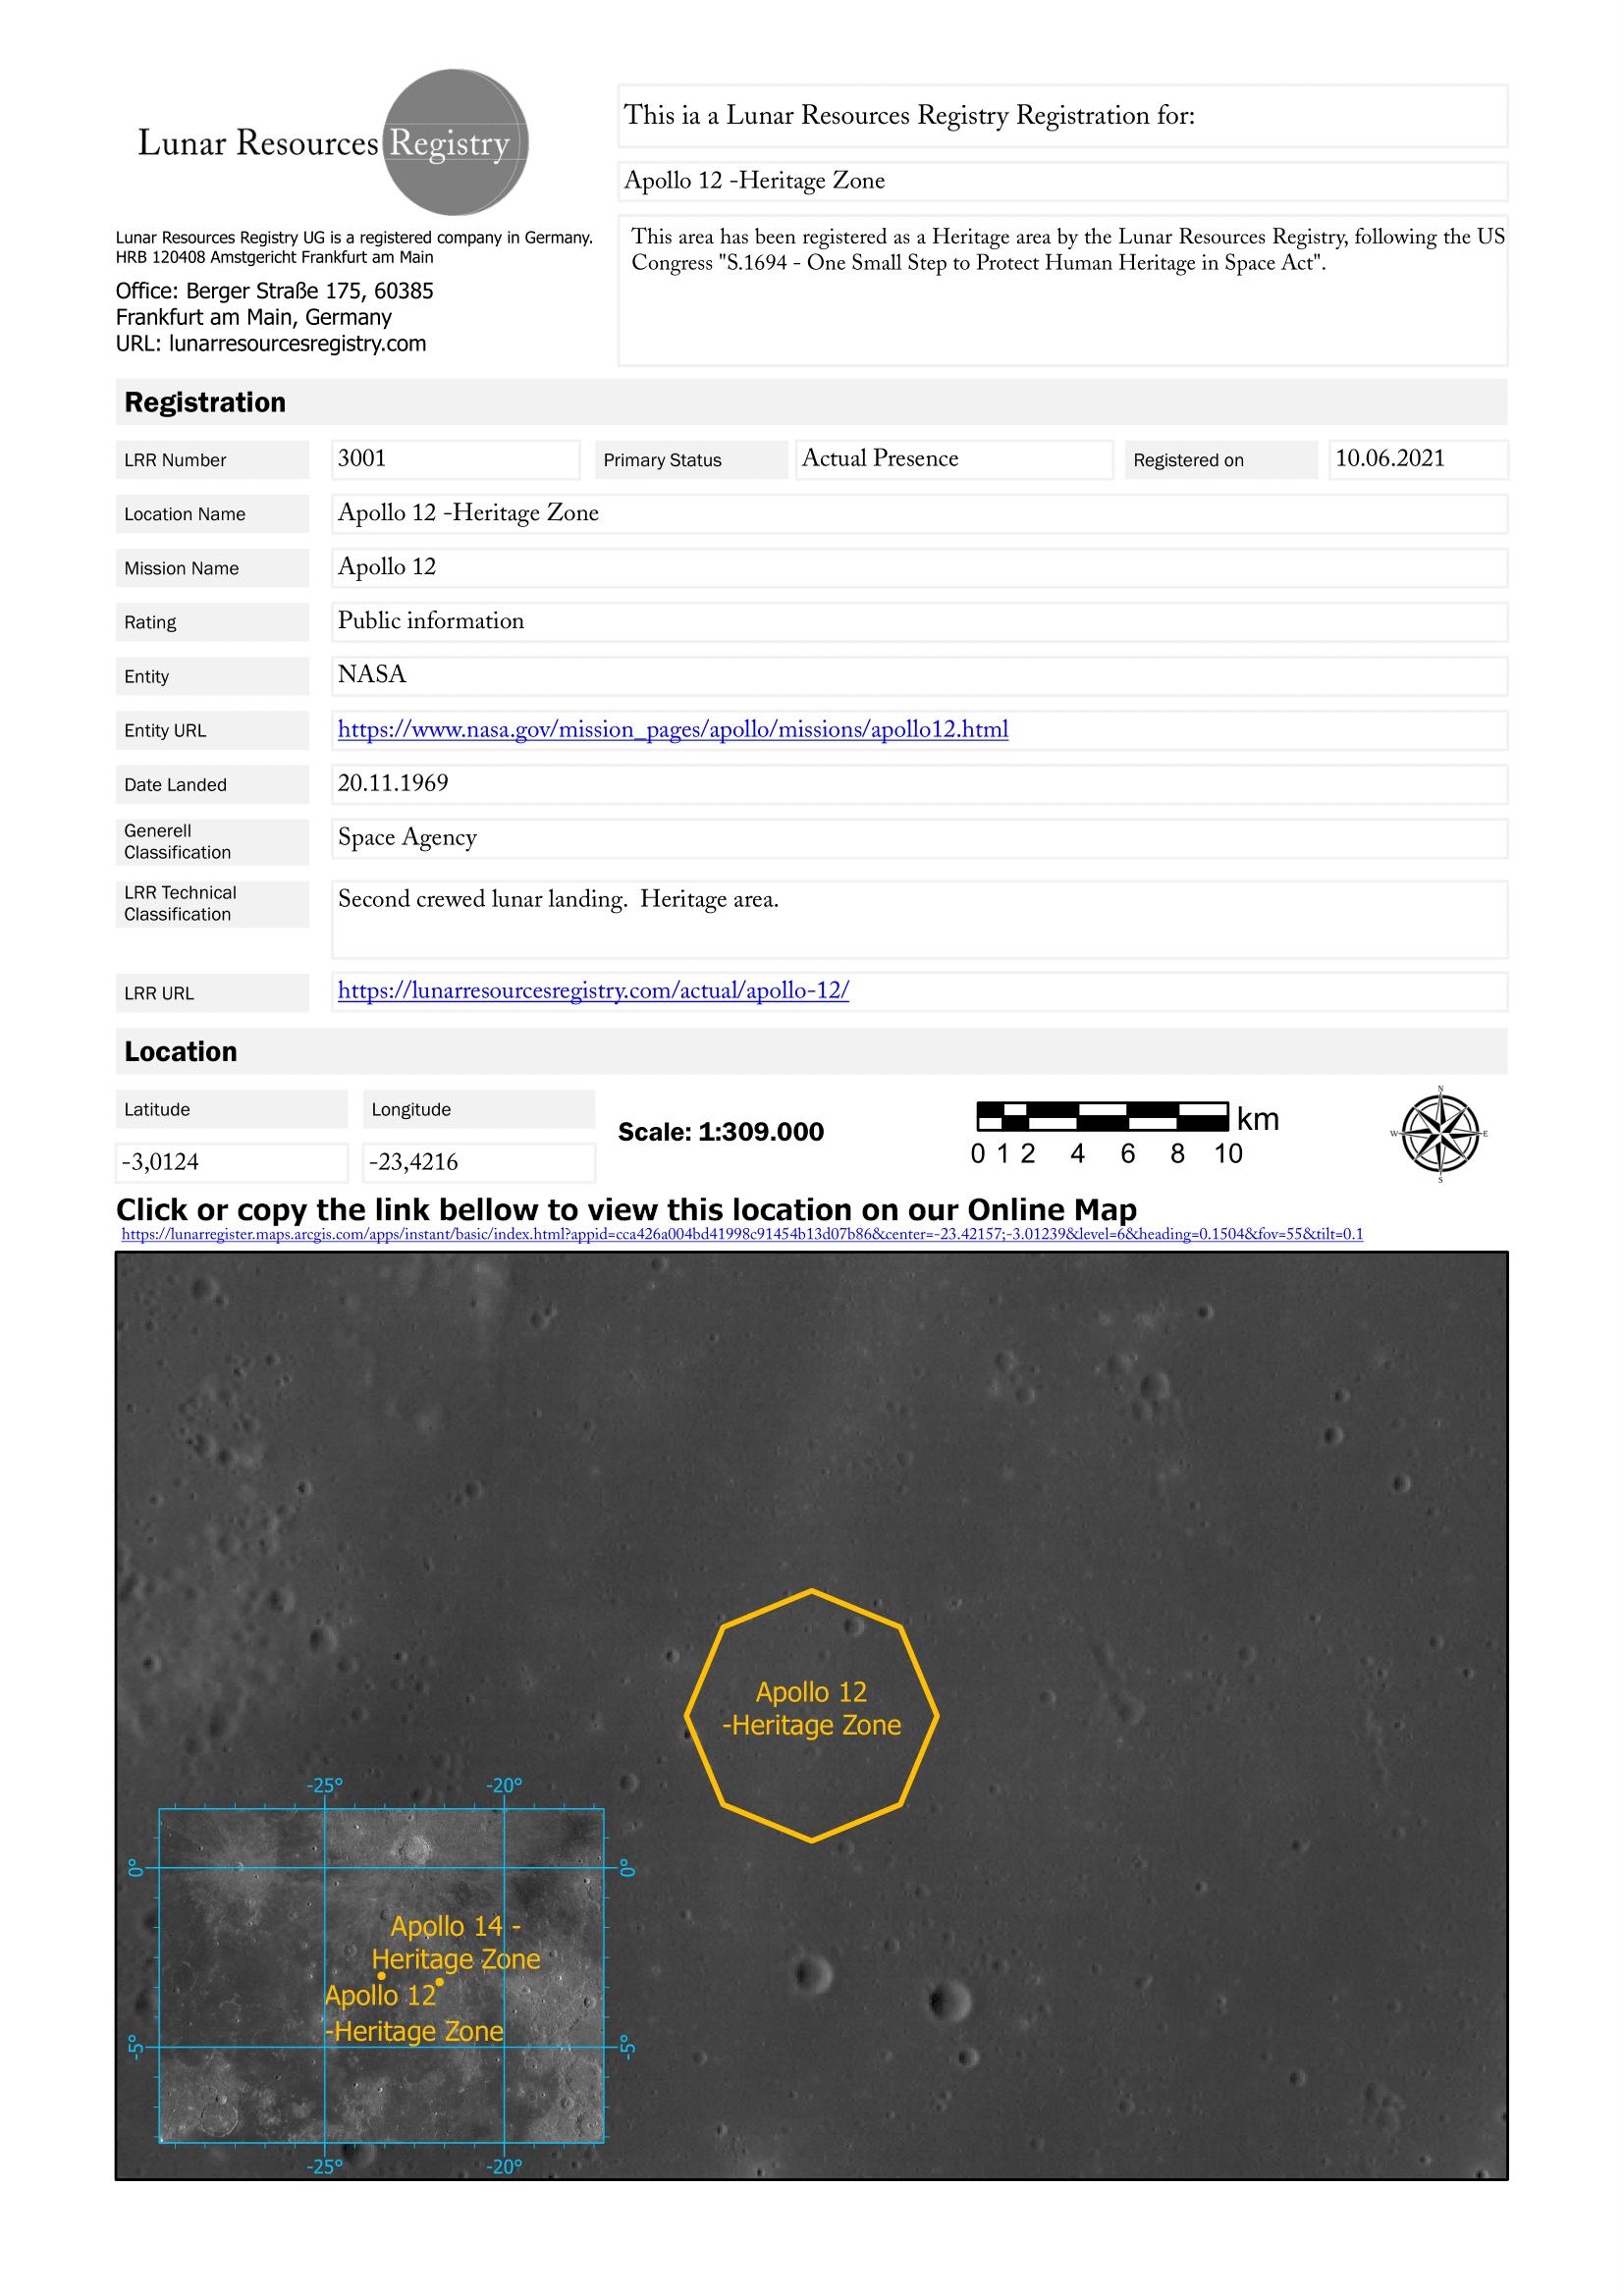 Lunar Resources Registration, Lunar Heritage Zone Apollo 11